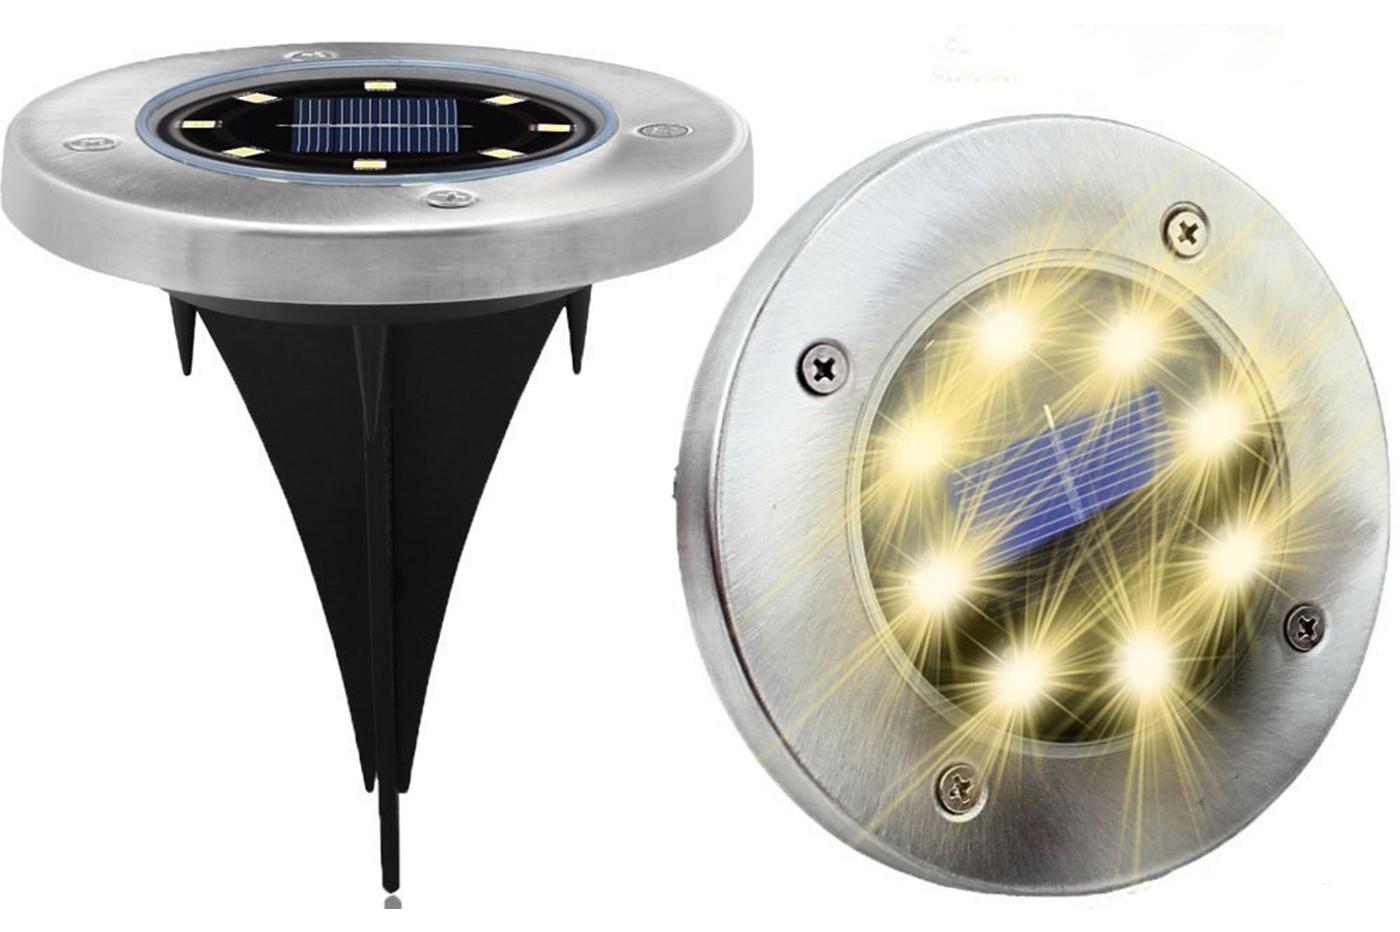 Bes 24181 segnapassi beselettronica faretto 8 led energia